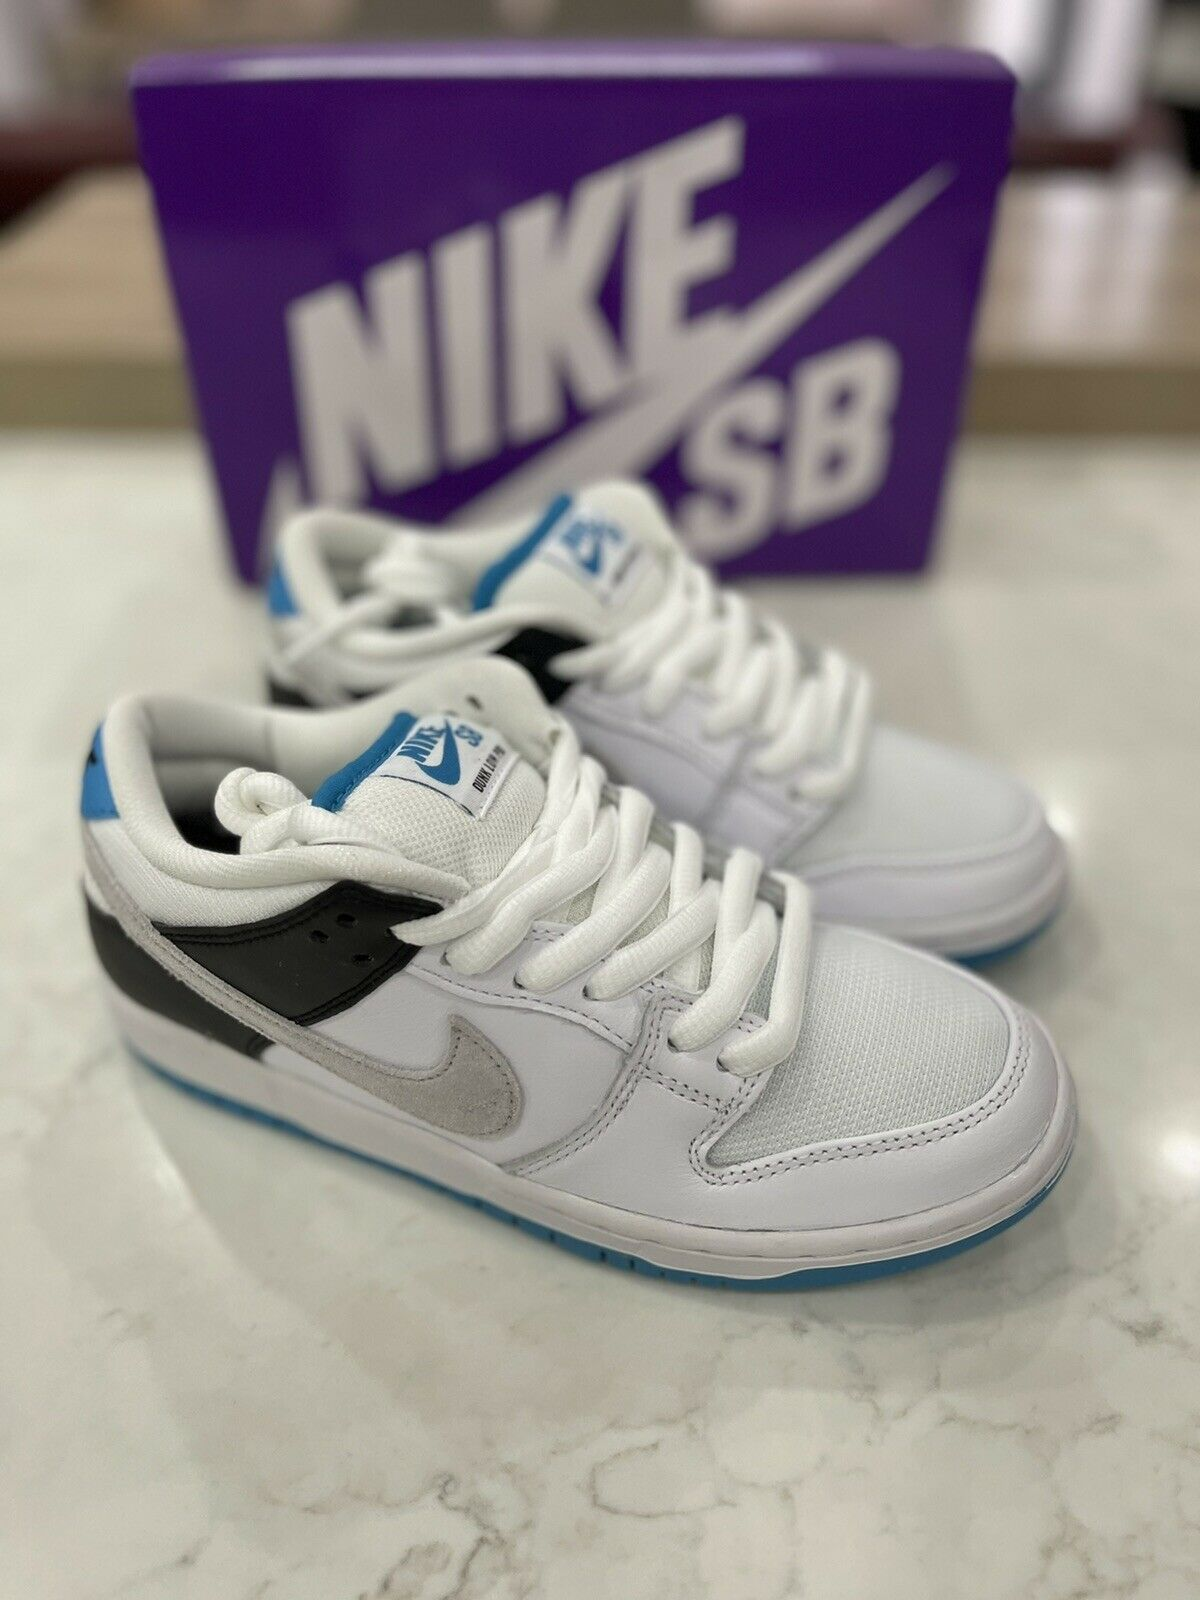 Nike SB Dunk Low Laser Blue - UK4/US4.5